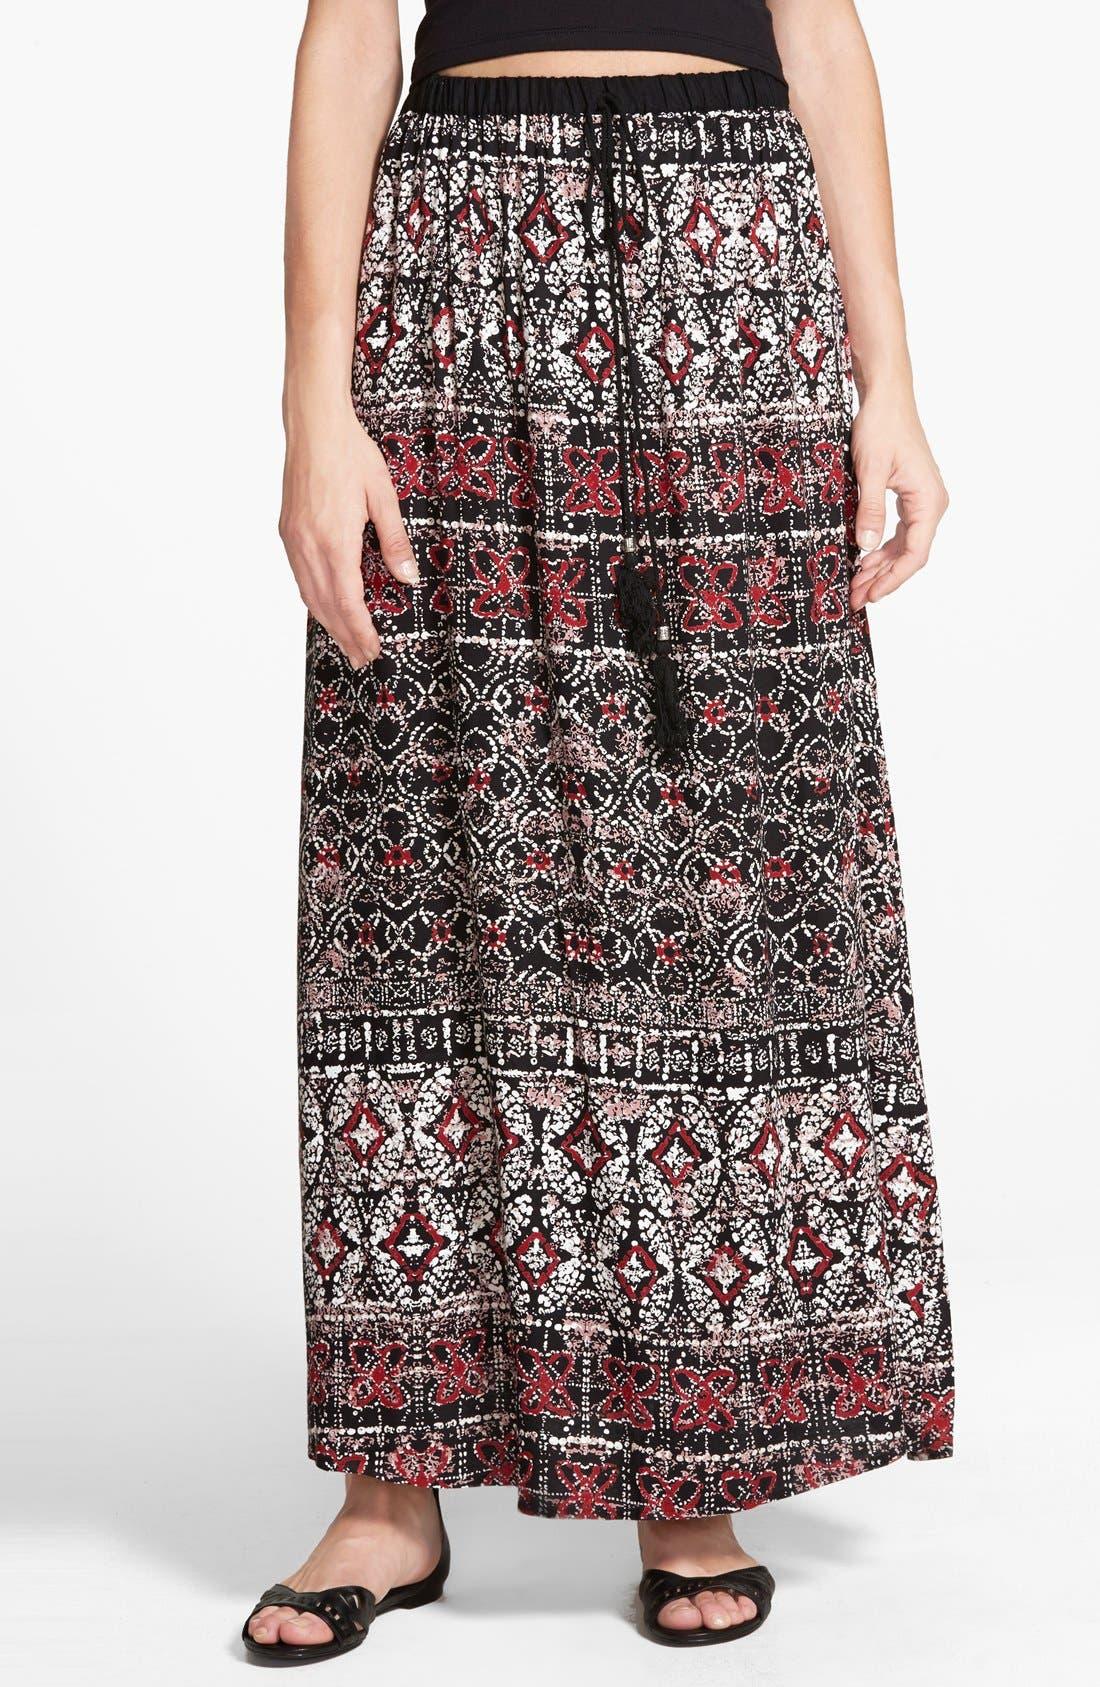 Alternate Image 1 Selected - Angie Mixed Print Maxi Skirt (Juniors)